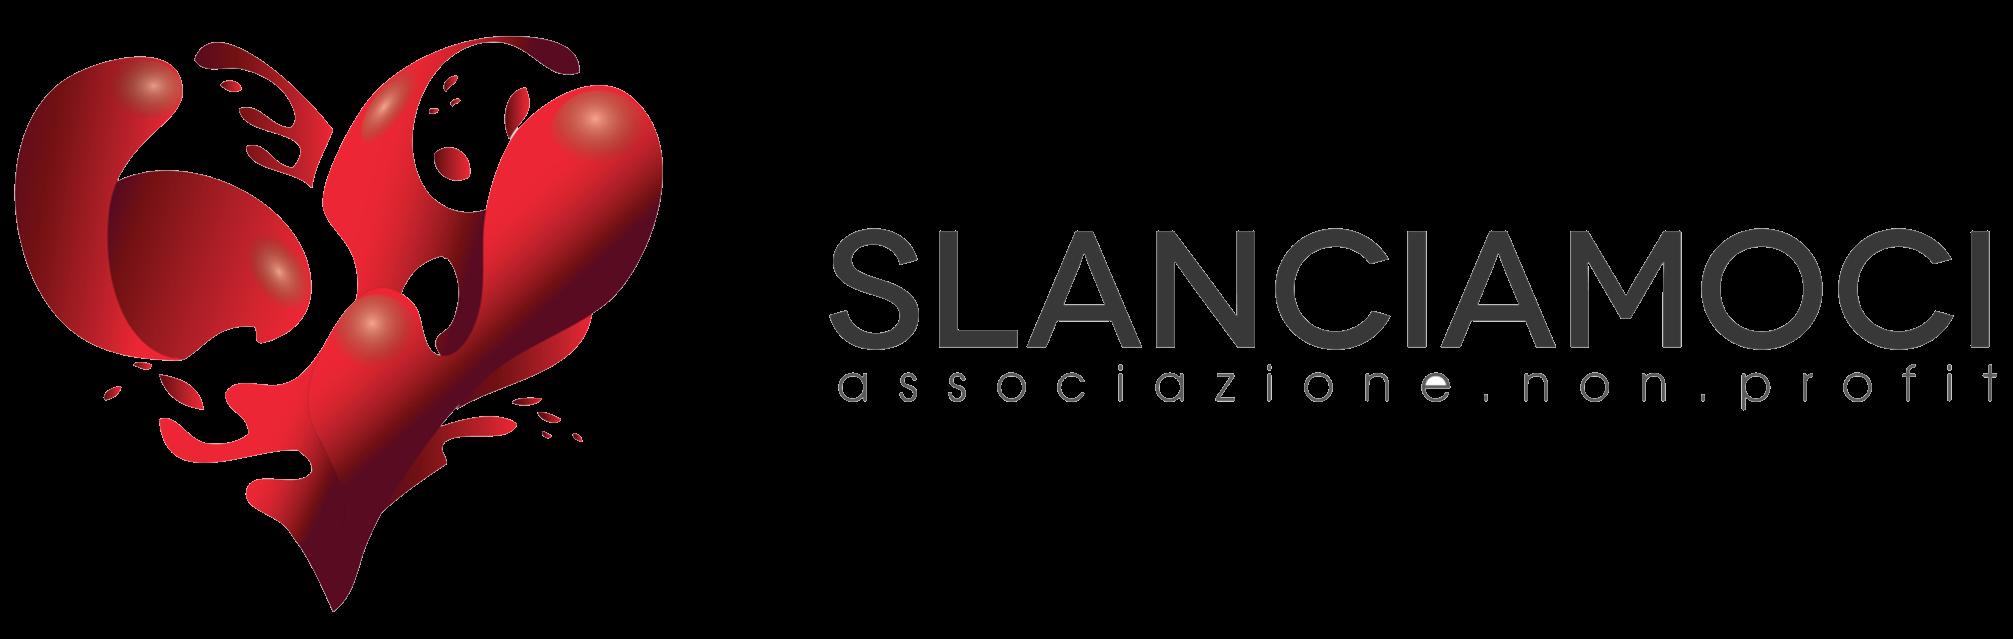 Slanciamoci Rock - Associazione No Profit